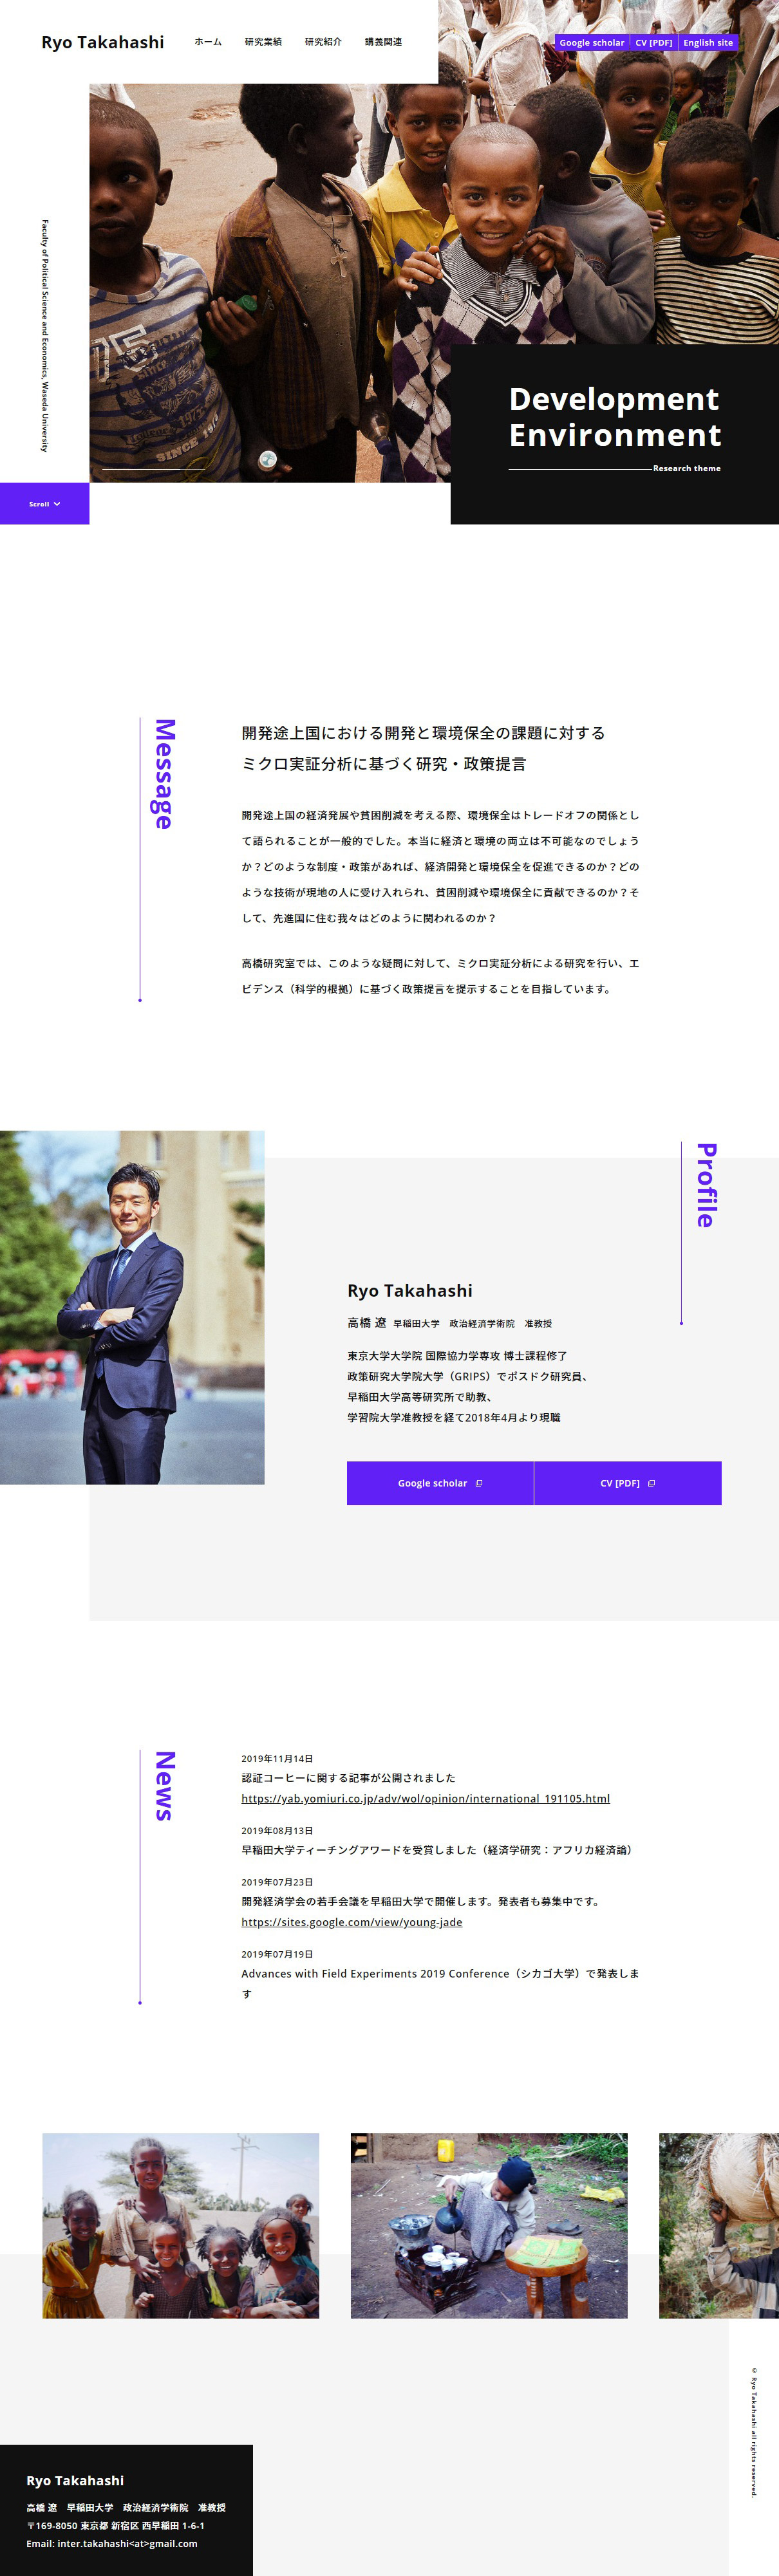 Ryo Takahashi   高橋 遼   早稲田大学 政治経済学術院 准教授